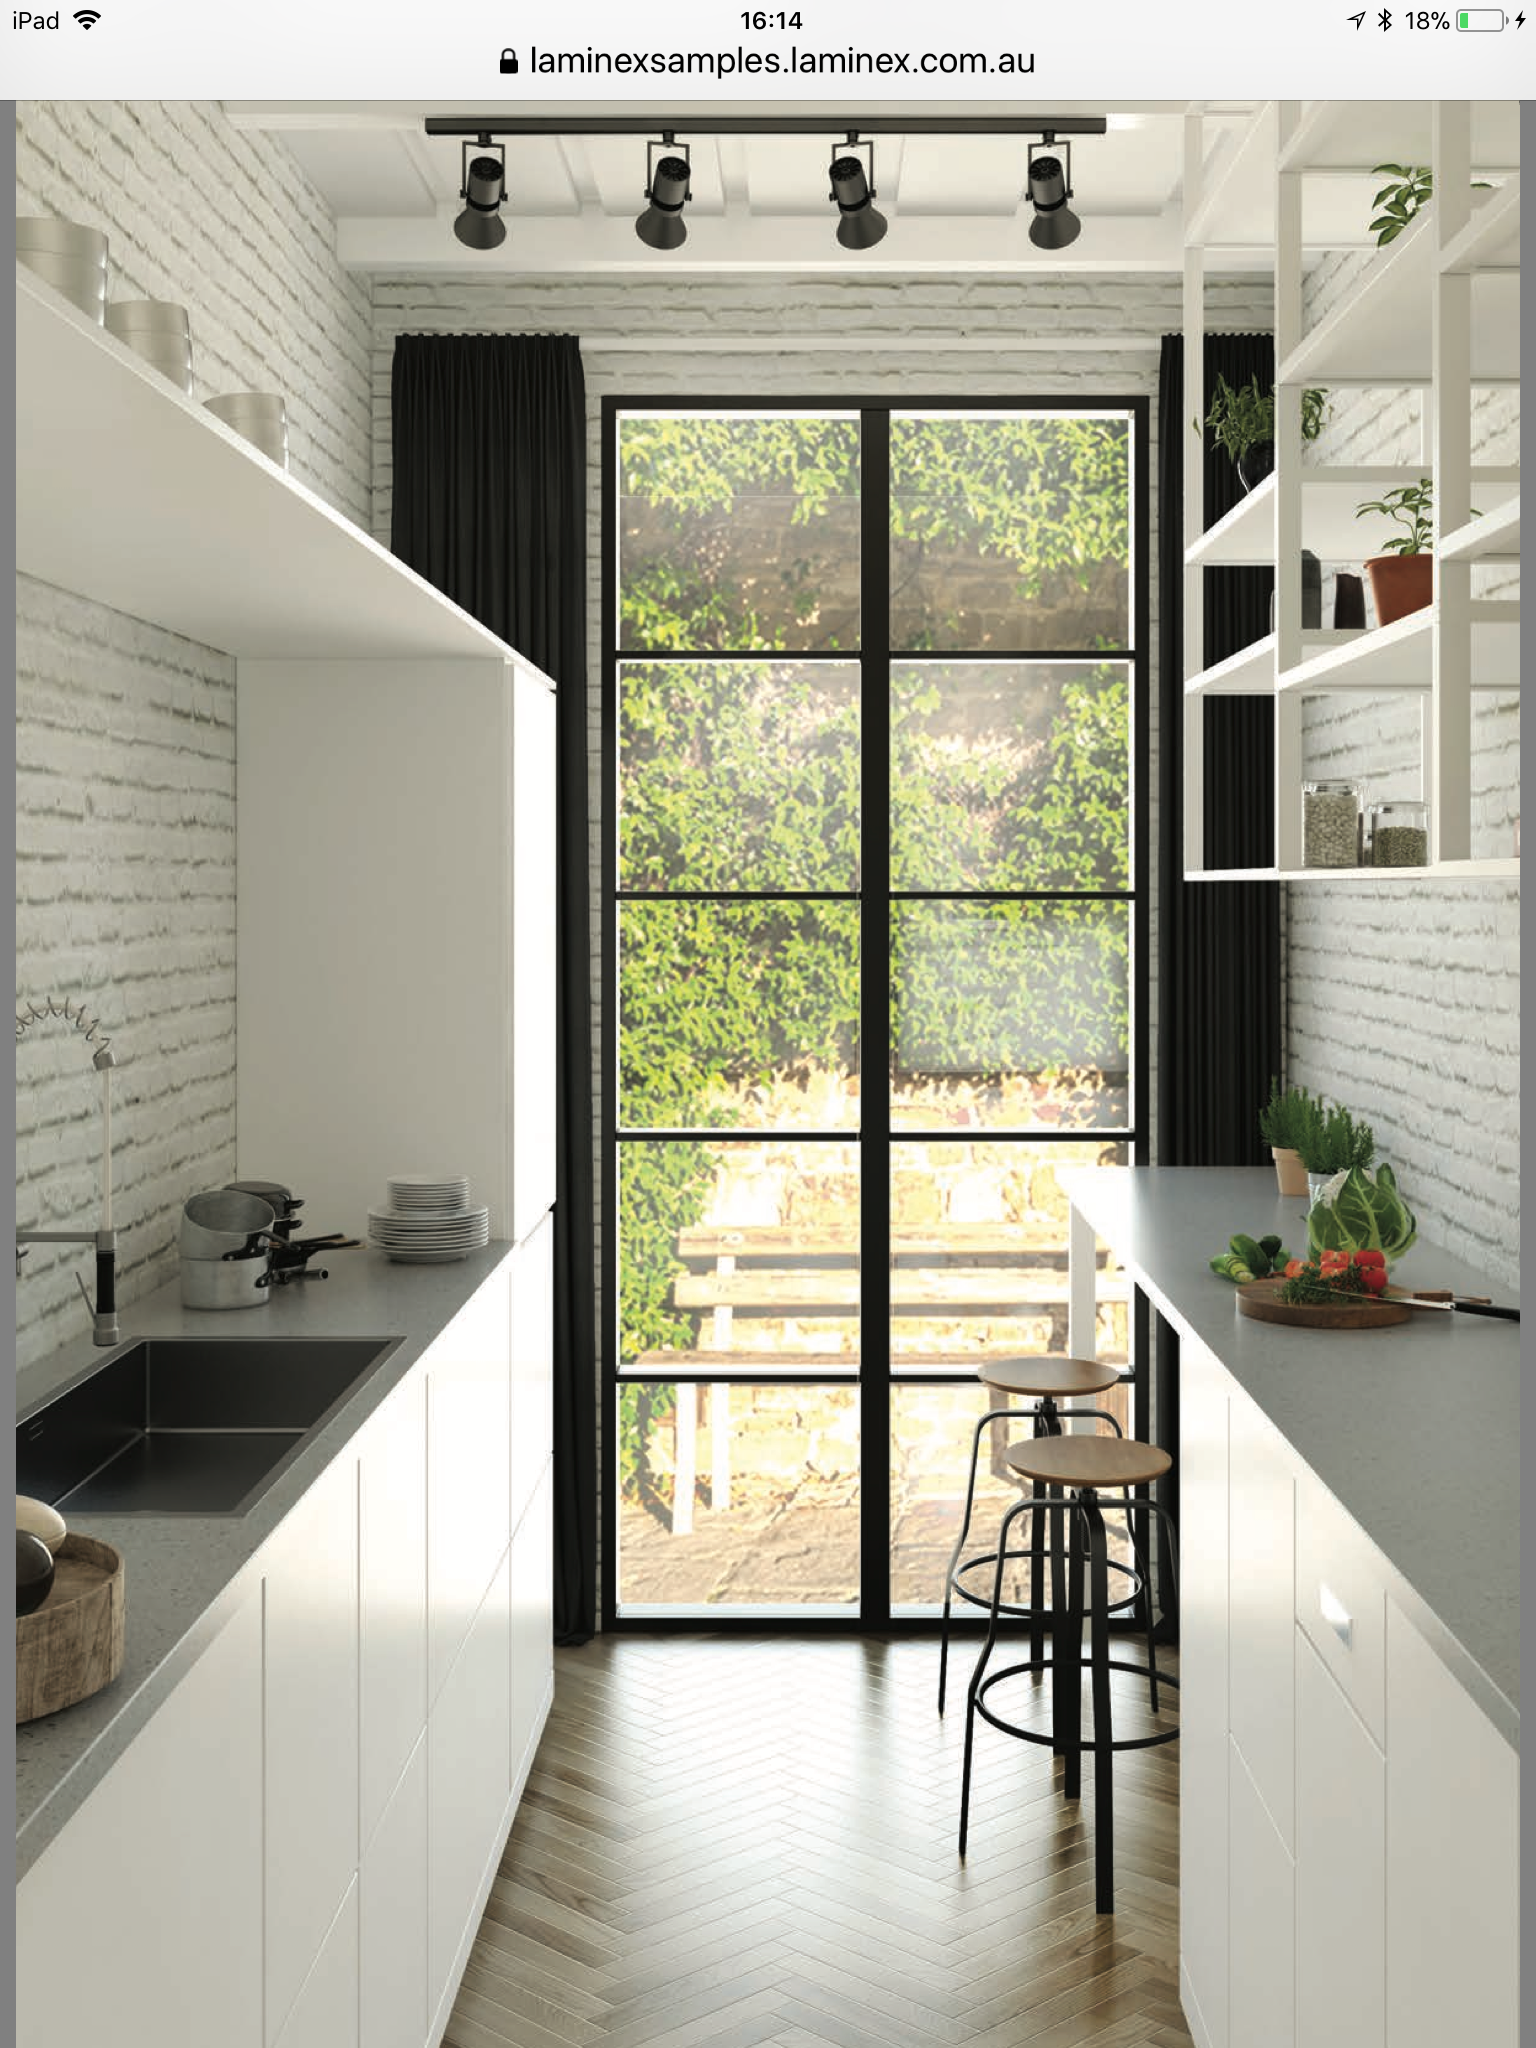 Laminex Colour Palette Ghost Gum | Kitchen trends, Home ...